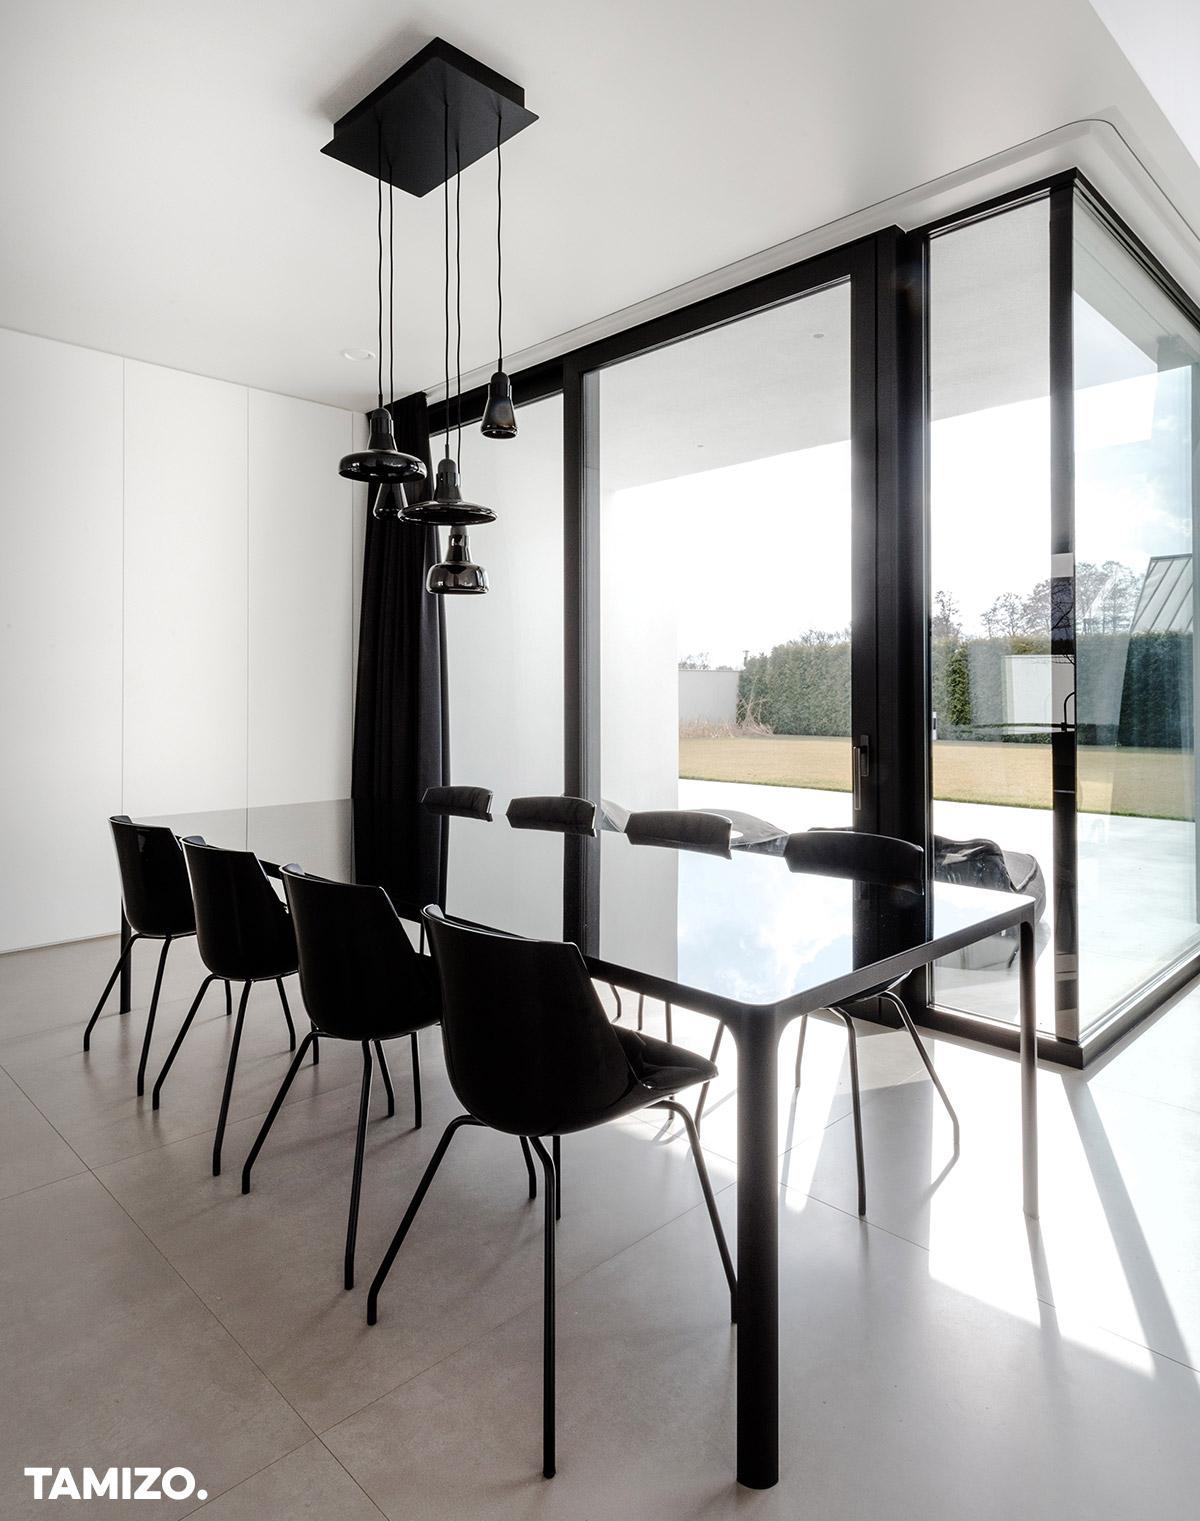 014_tamizo_architects_interior_house_realization_warsaw_poland_20